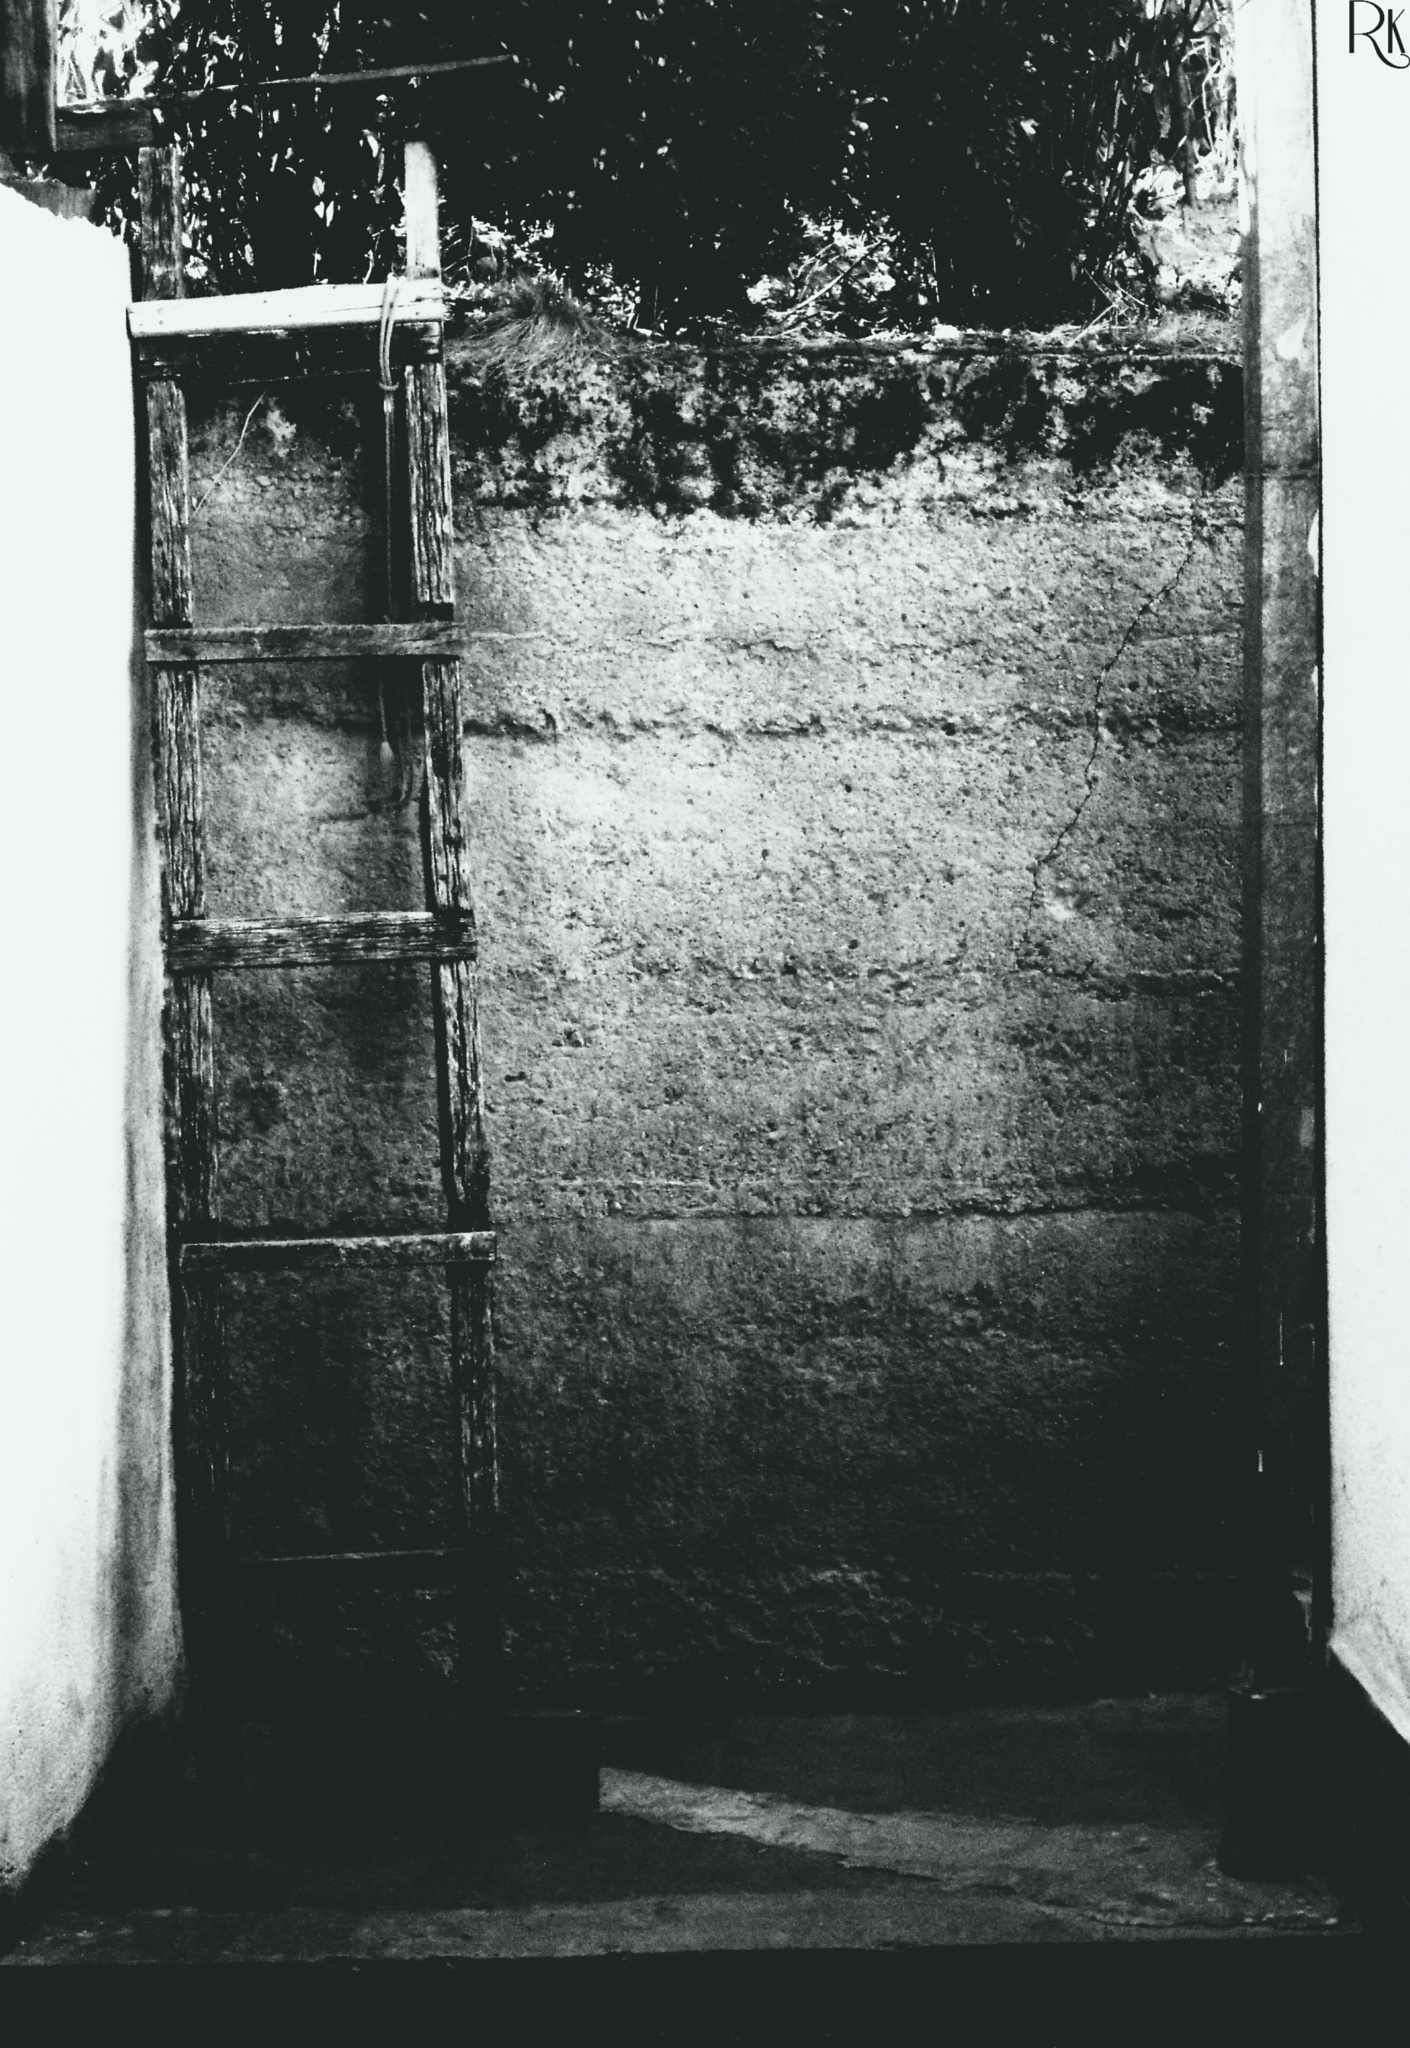 Wooden Ladder by Robert Krstevski